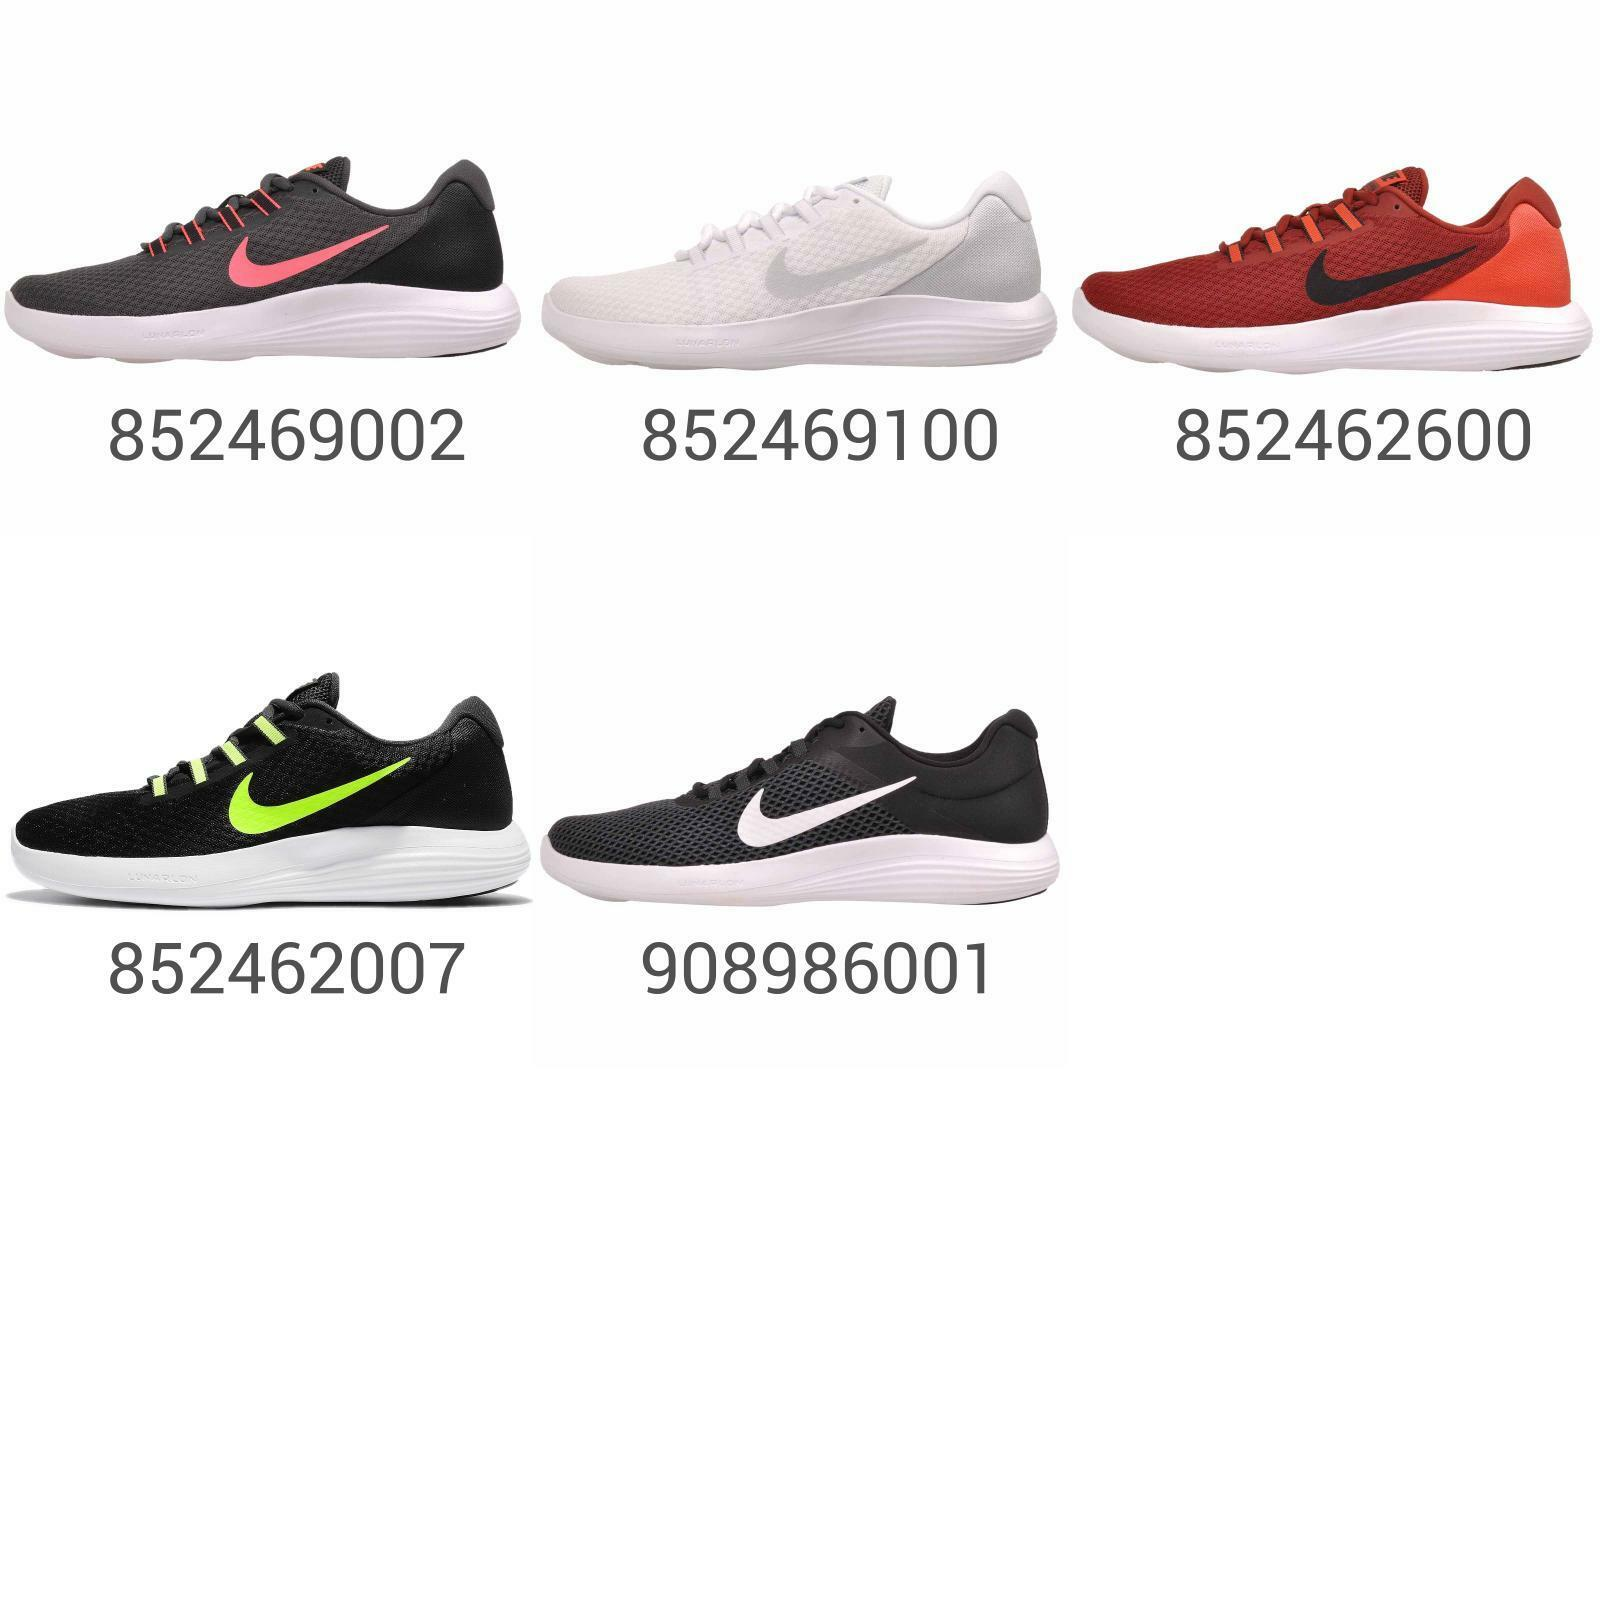 Nike Lunarconverge 2 hommes femmesRunningChaussuresSneakers Pick 1